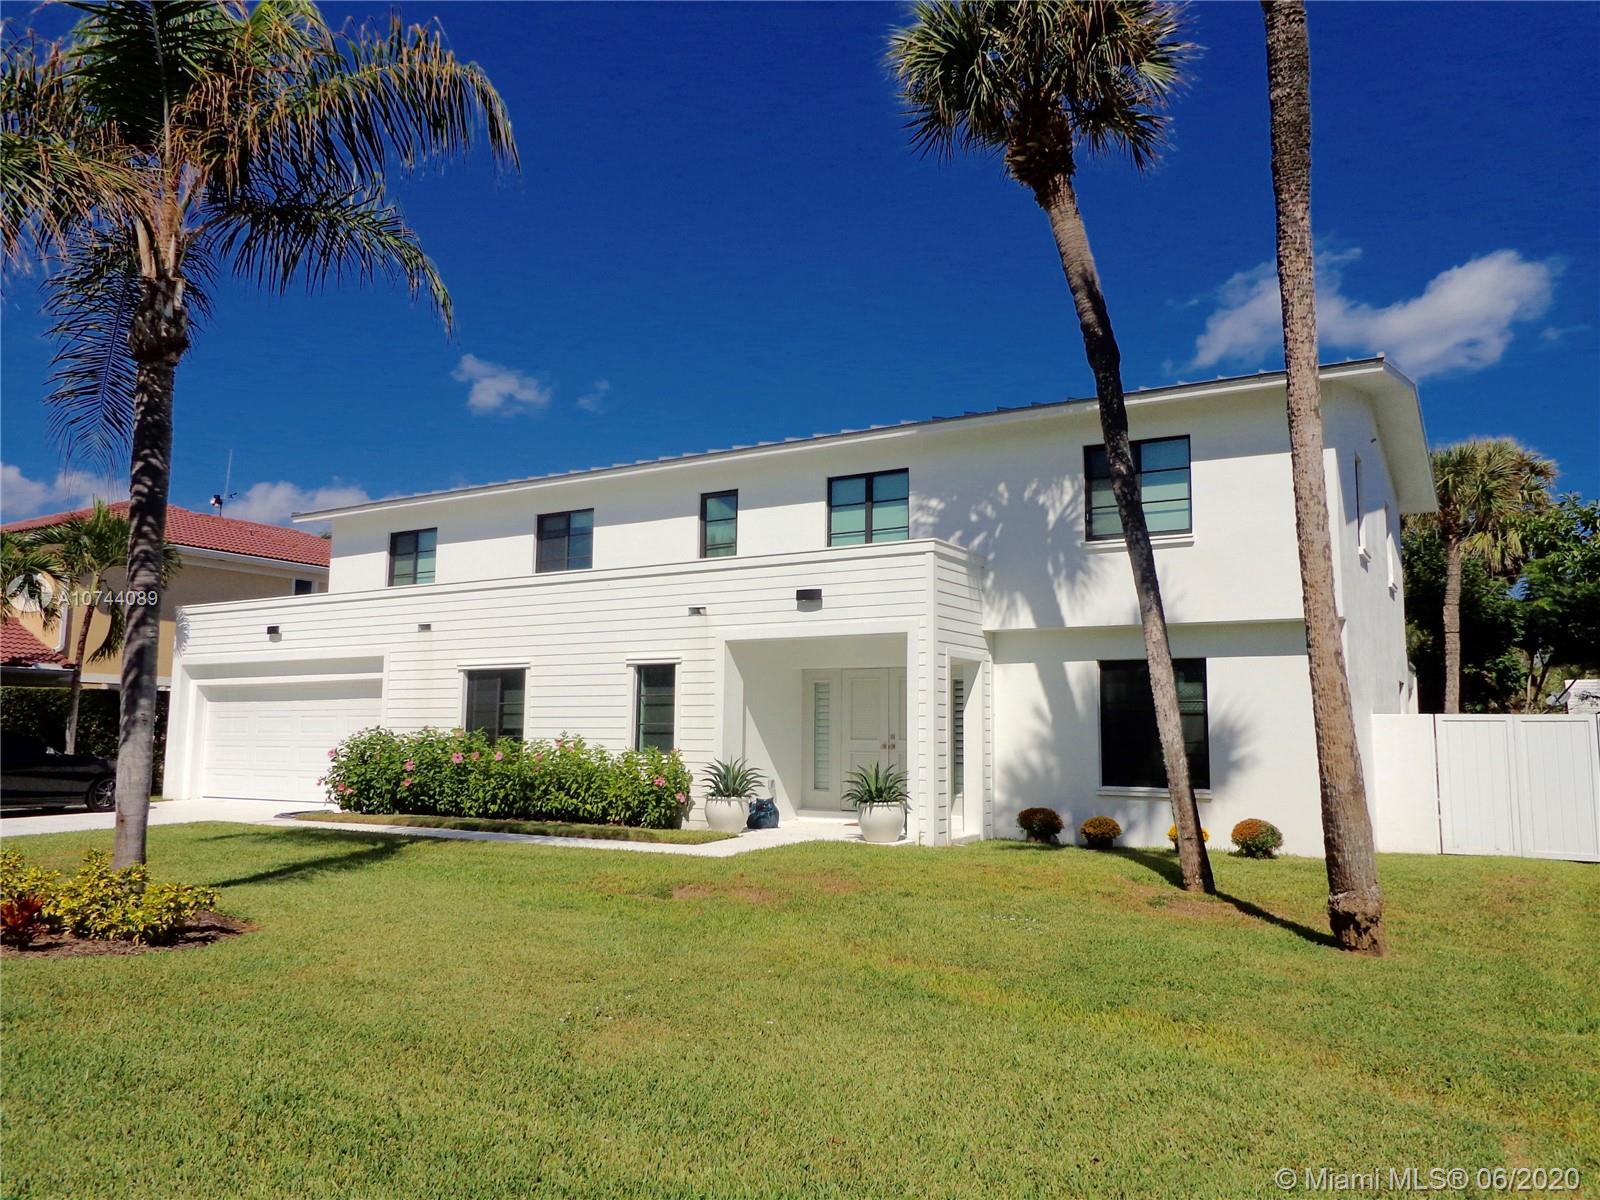 226 Cove Pl, Jupiter Inlet Colony, FL 33469